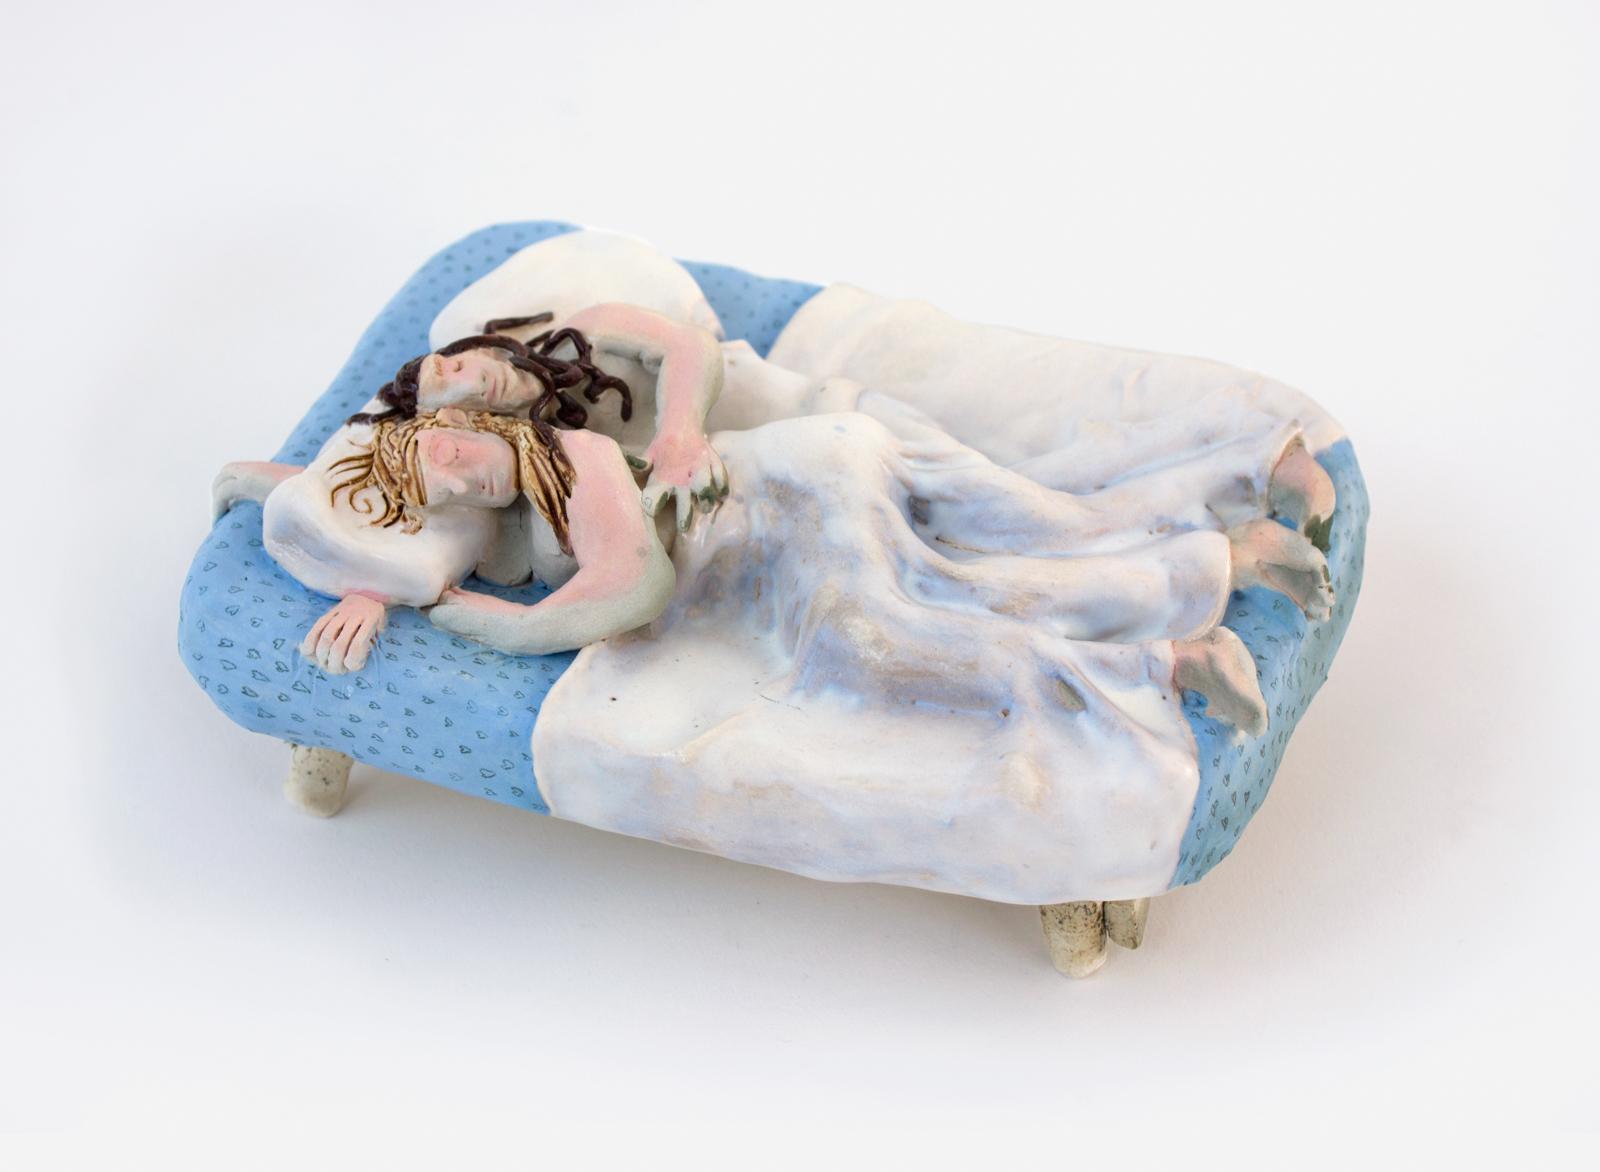 Sleep With You , 2018. Glazed Porcelain, 8.5 x 6.5 x 3.5 inches